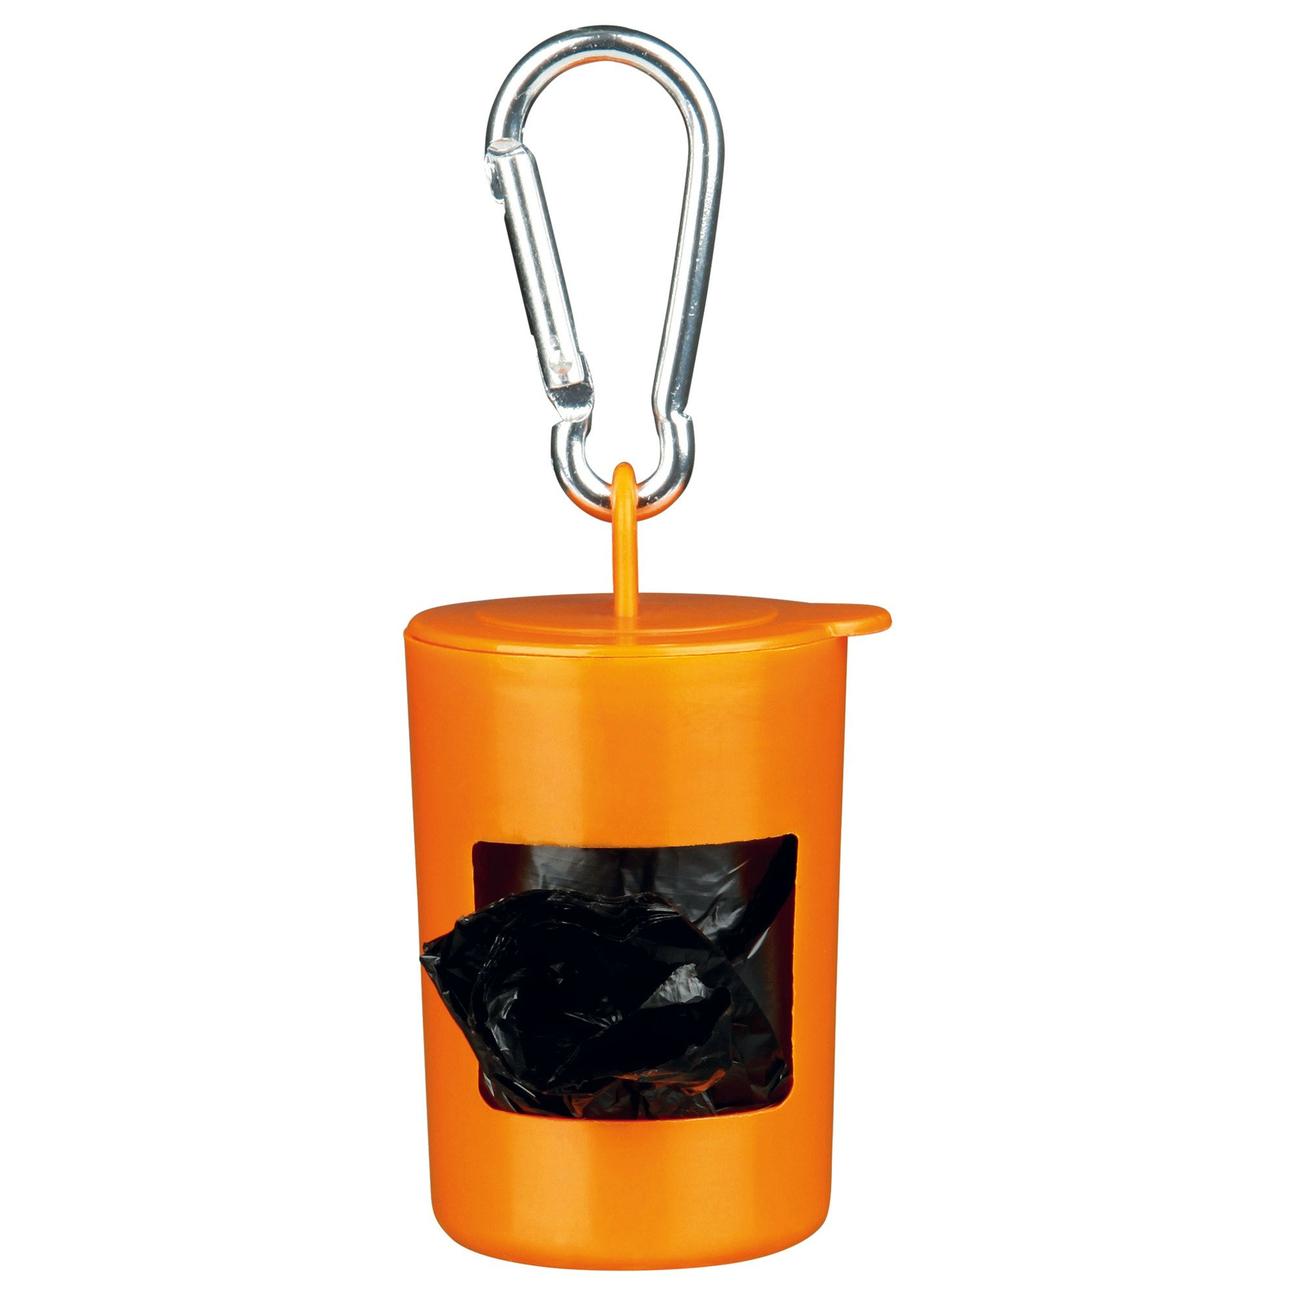 Trixie Hundekotbehälter Spender aus Kunststoff 2331, Bild 2